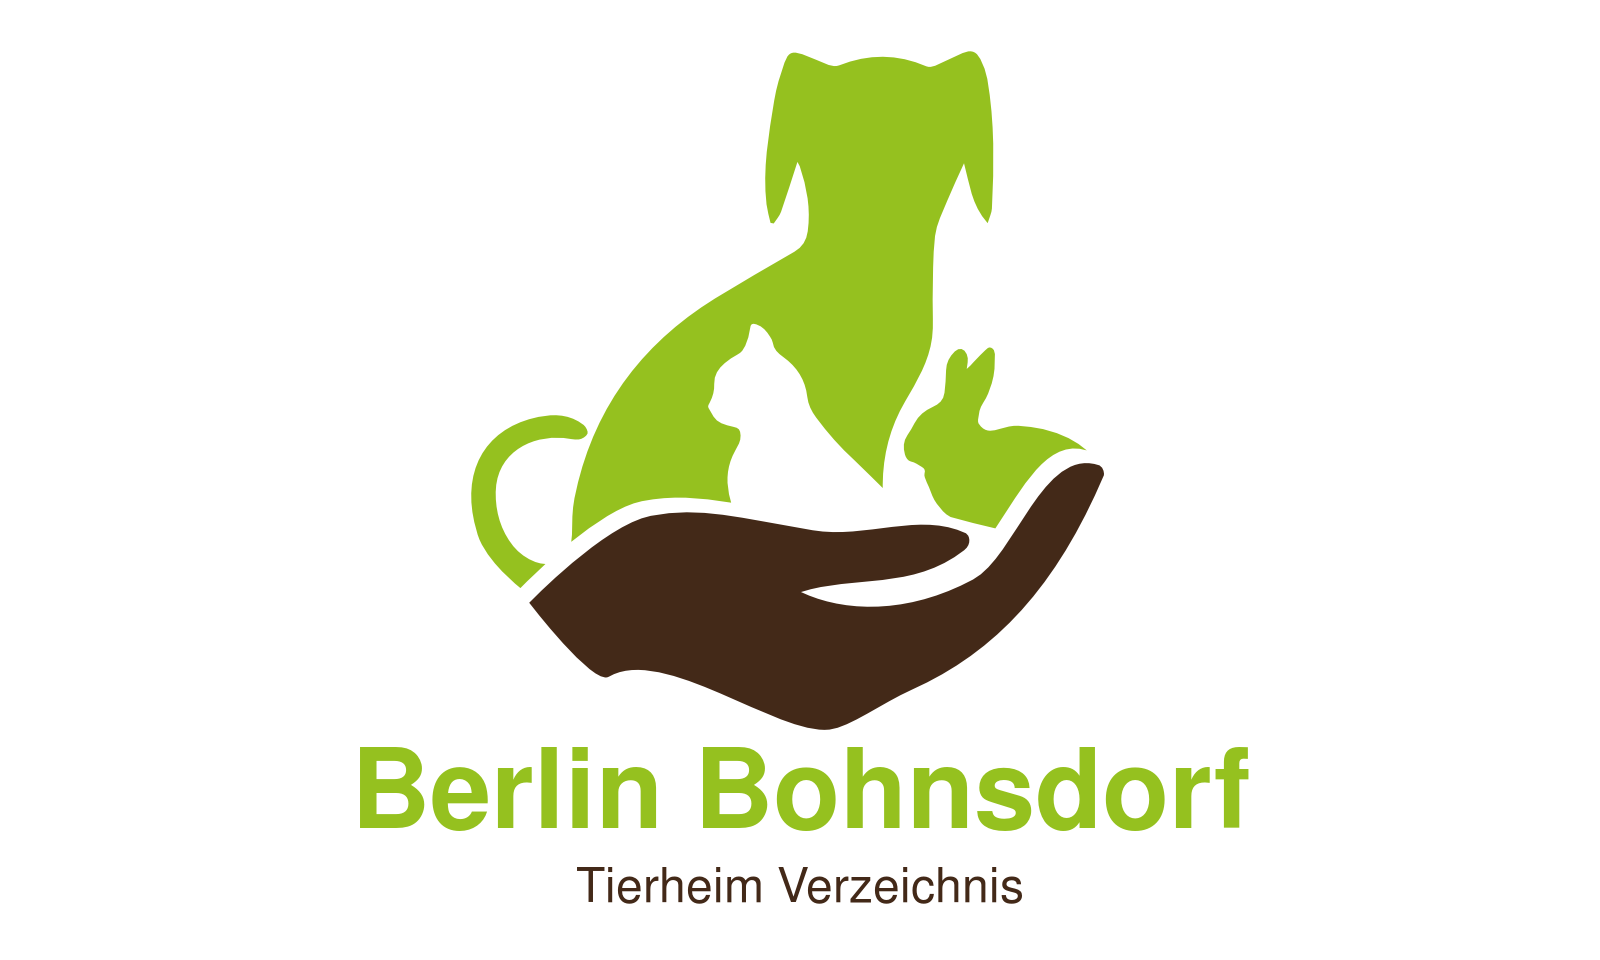 Tierheim Berlin Bohnsdorf